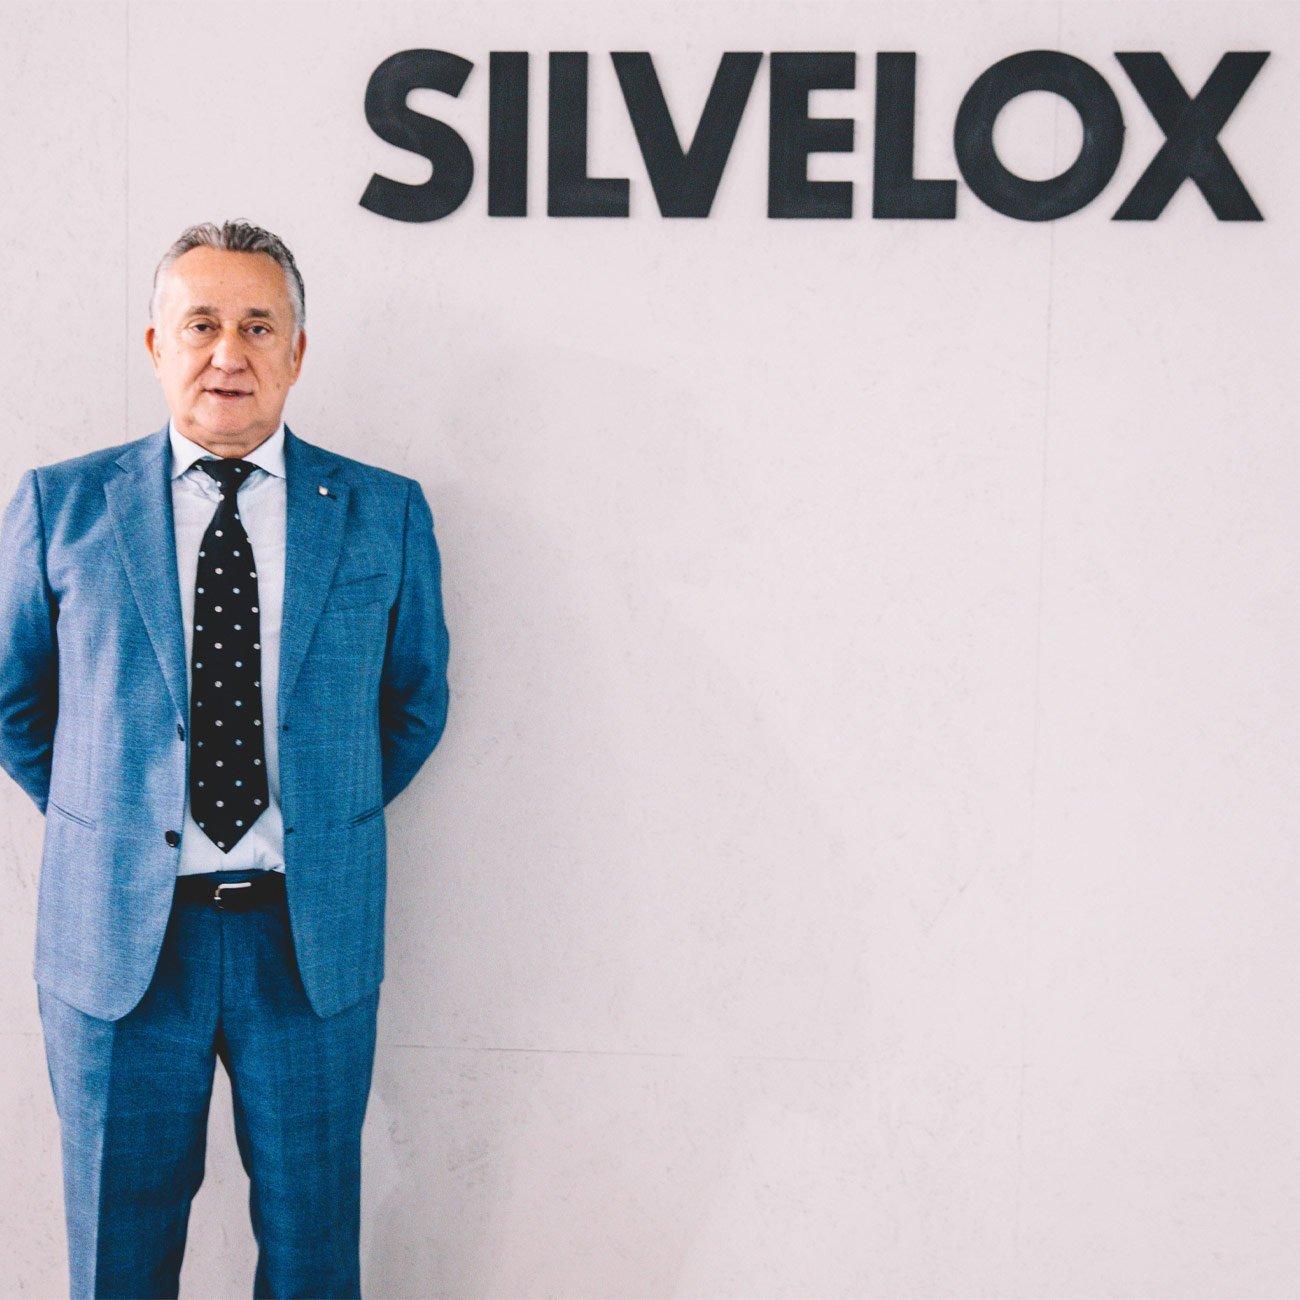 Silvelox